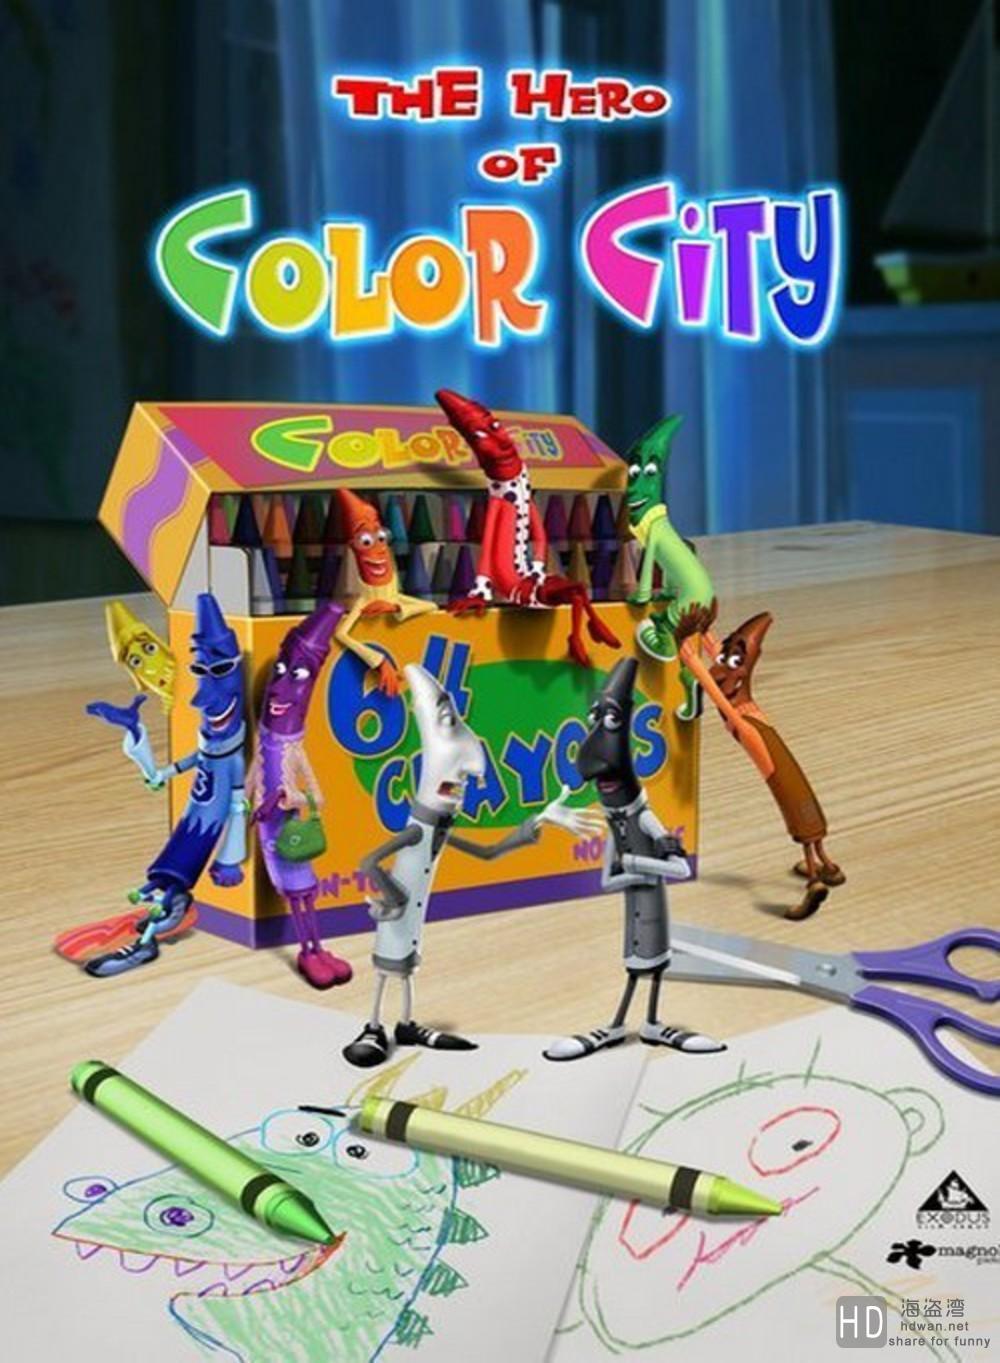 小蜡笔们的彩色世界大冒险 The Hero of Color City (2014)